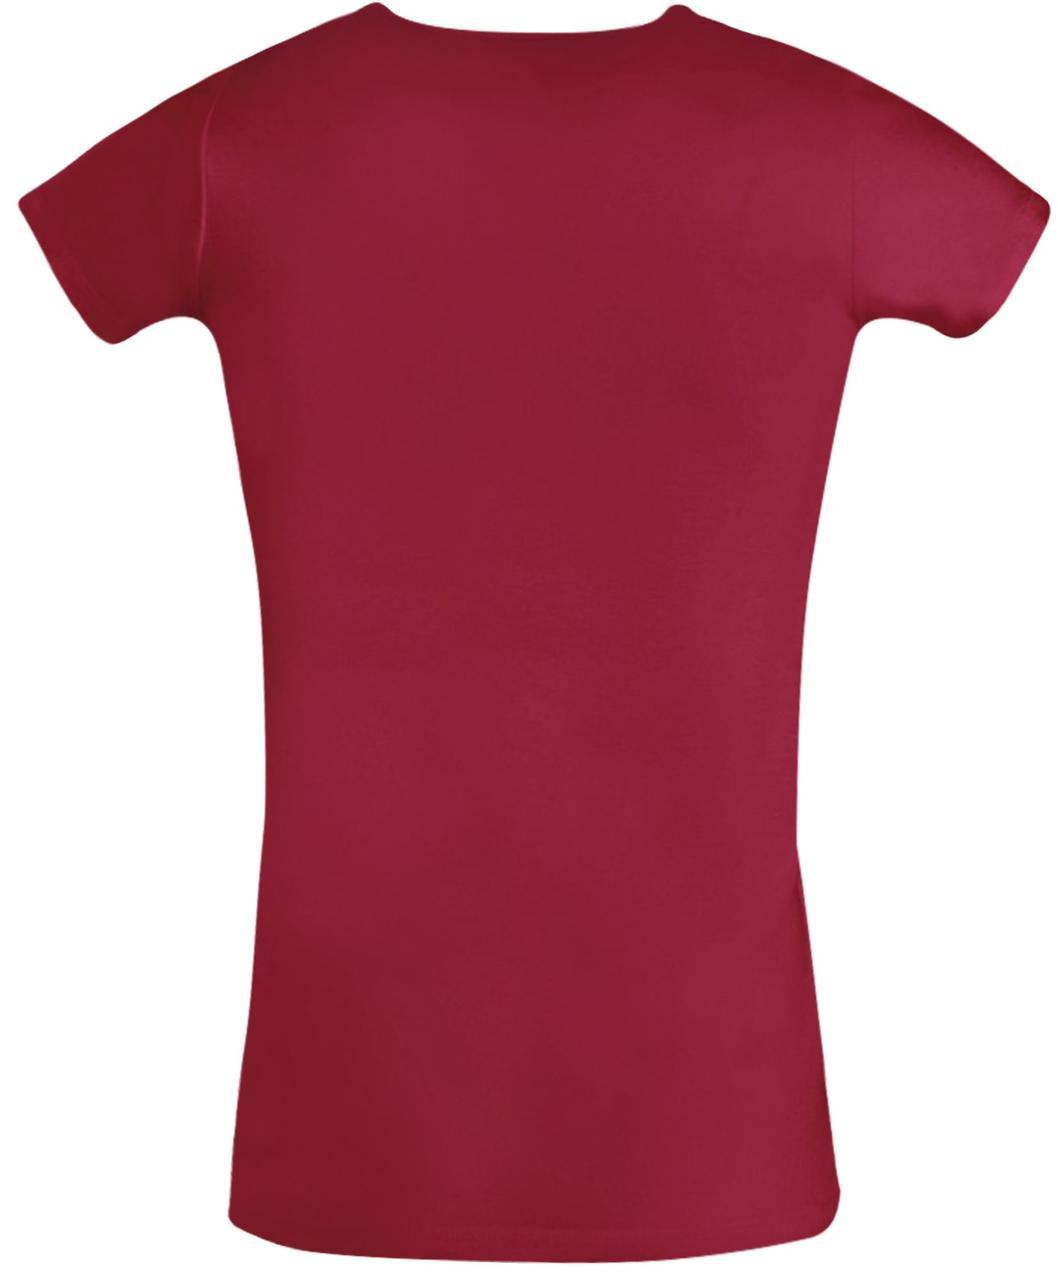 Футболка женская Moody 160 красная (артикул 11865145) - фото 2